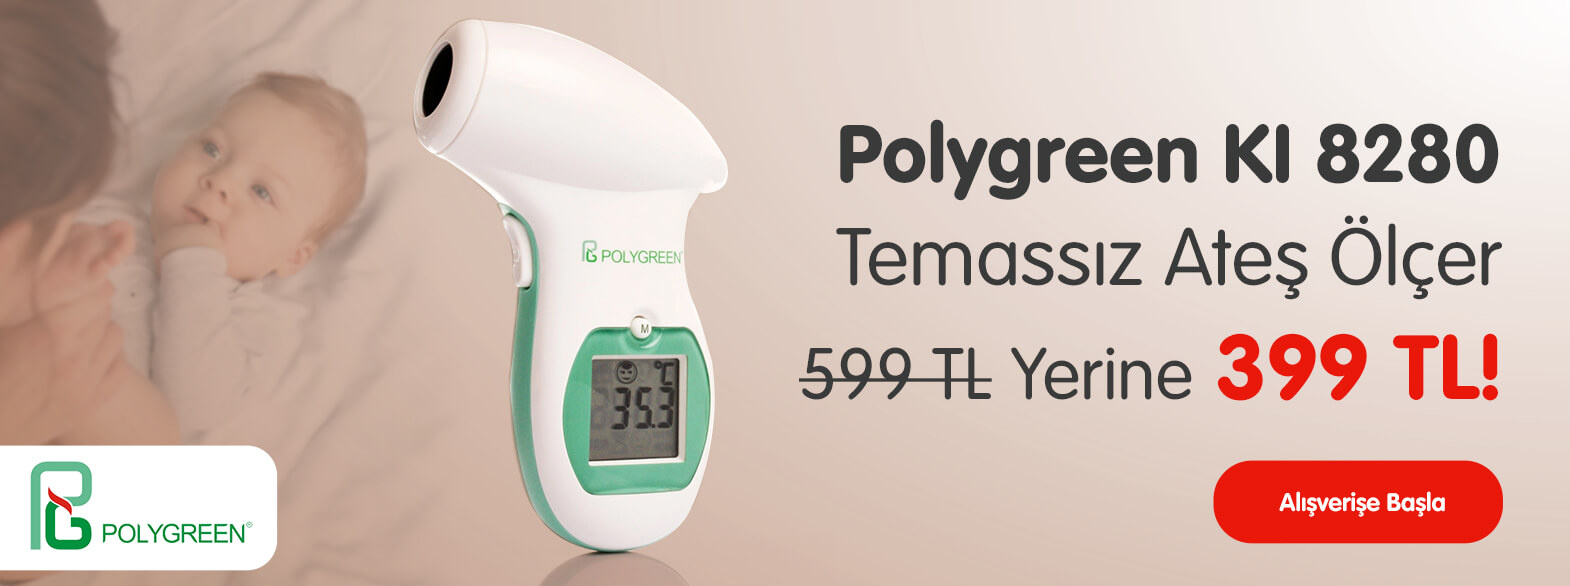 14-01-2021-polygreen-tr-yeni.jpg